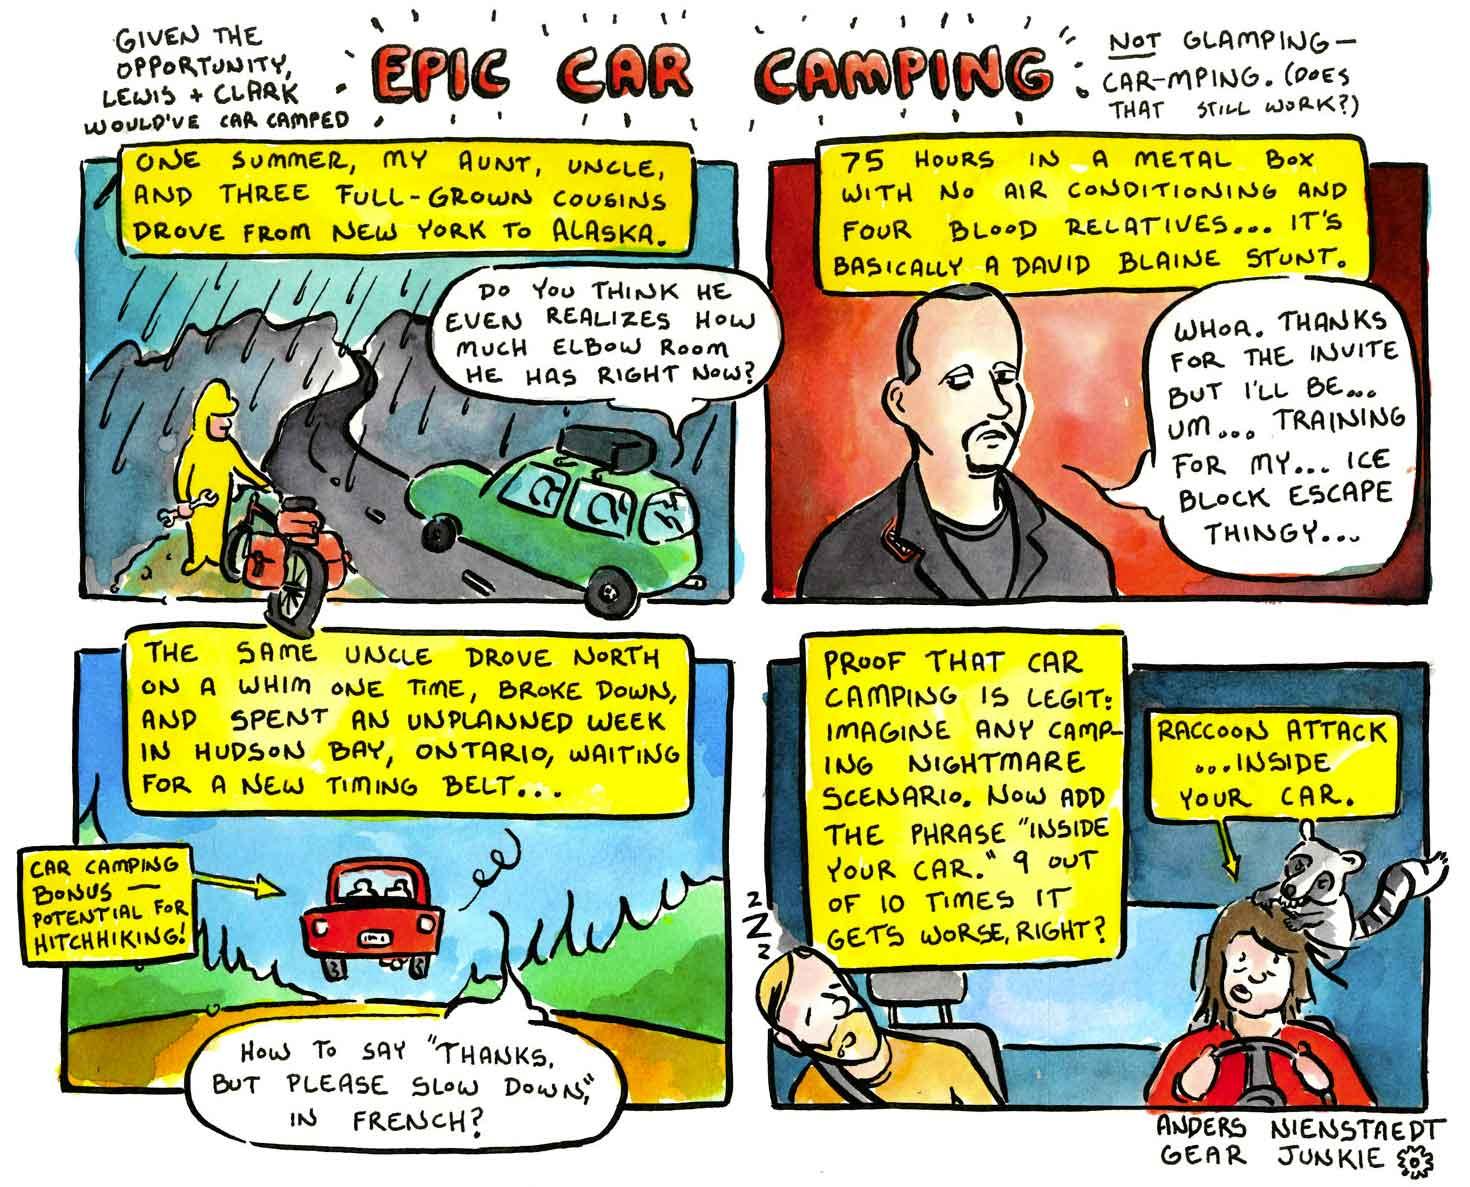 epic-car-camping